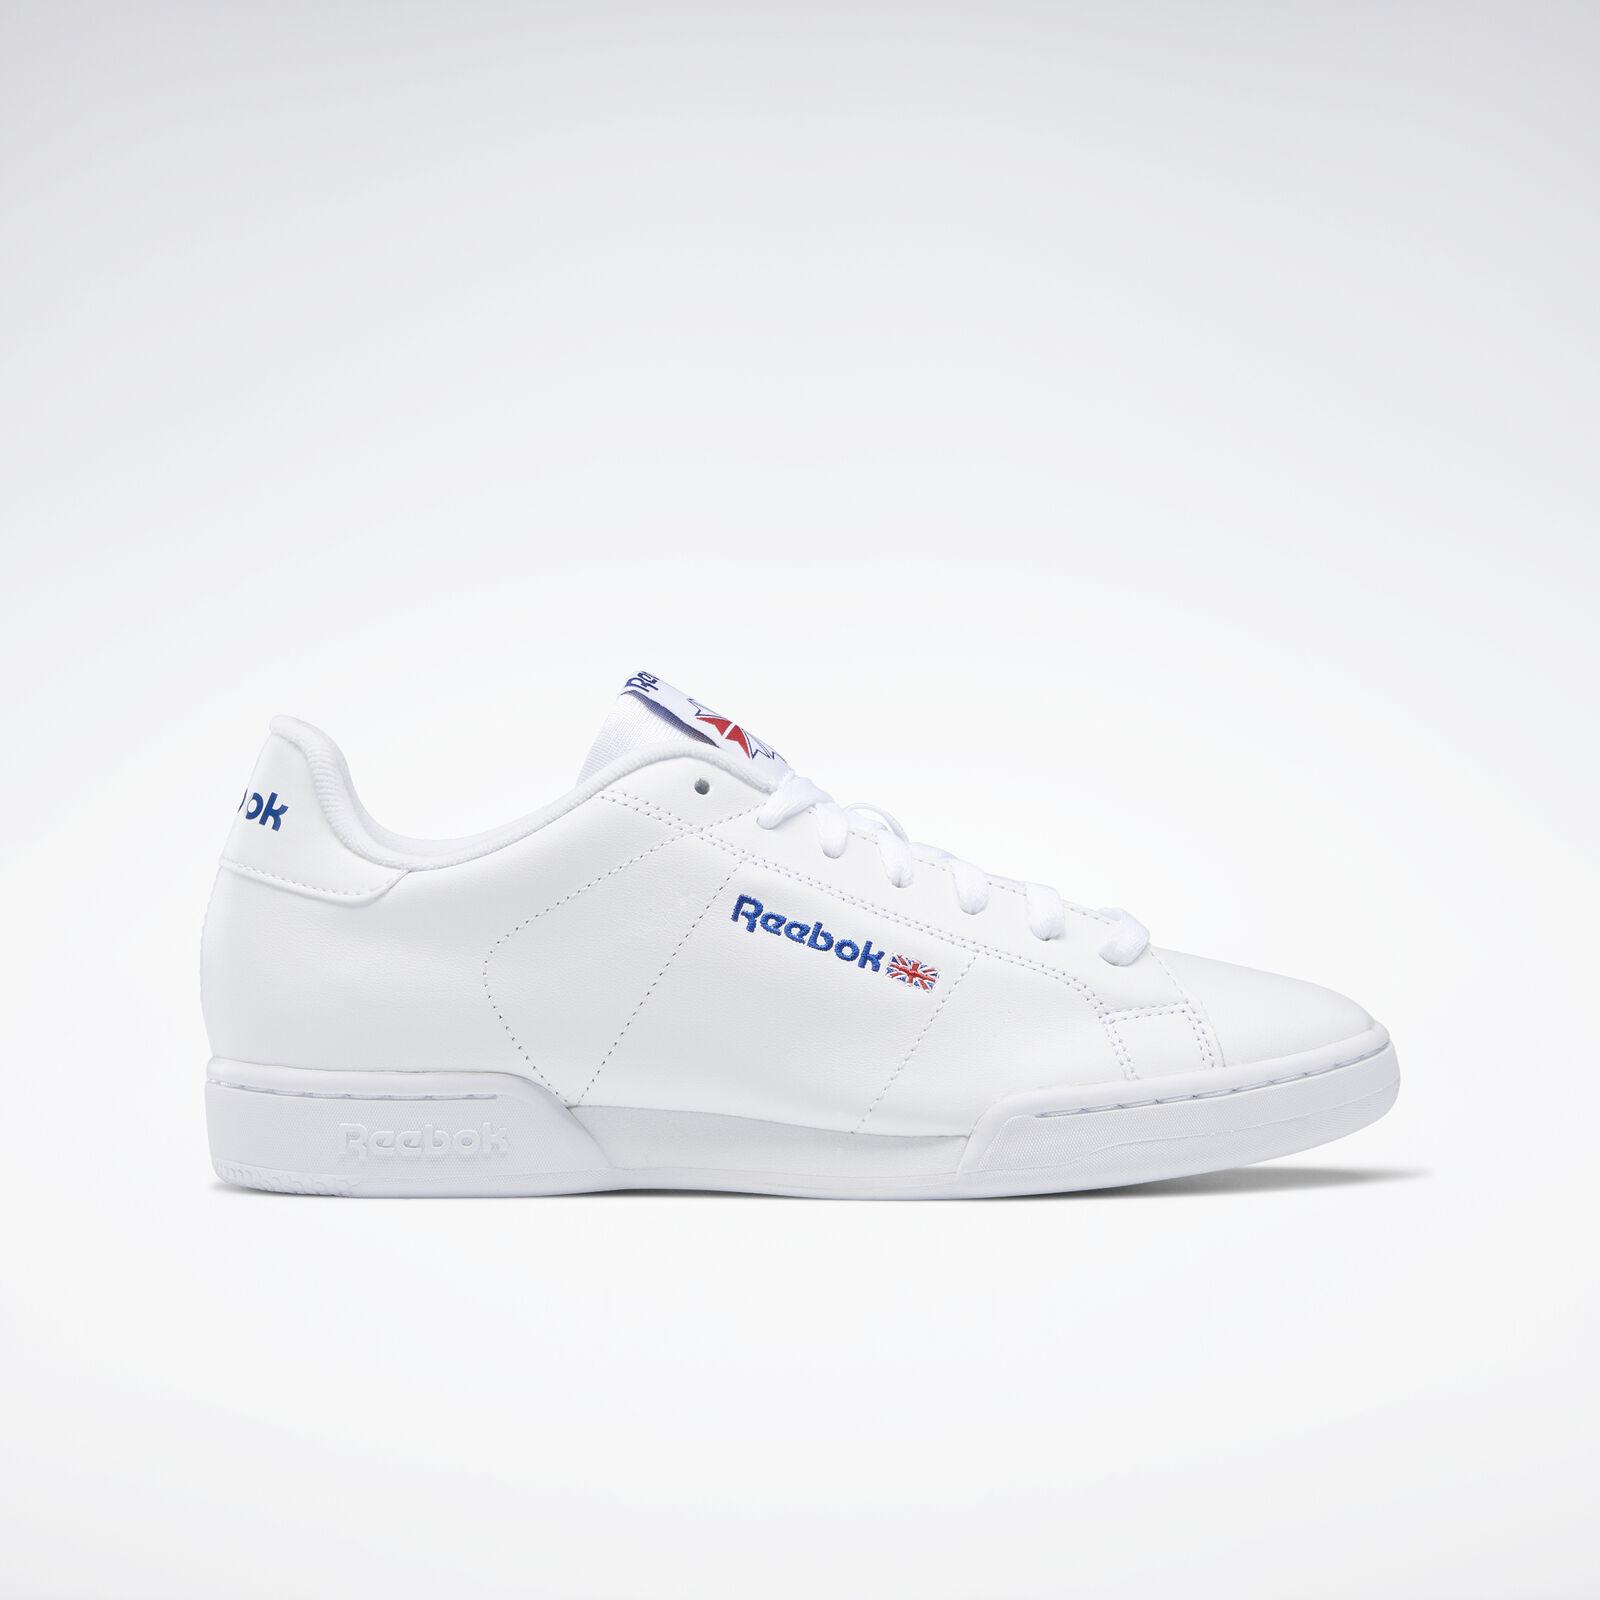 Reebok NPC II Men's Shoes